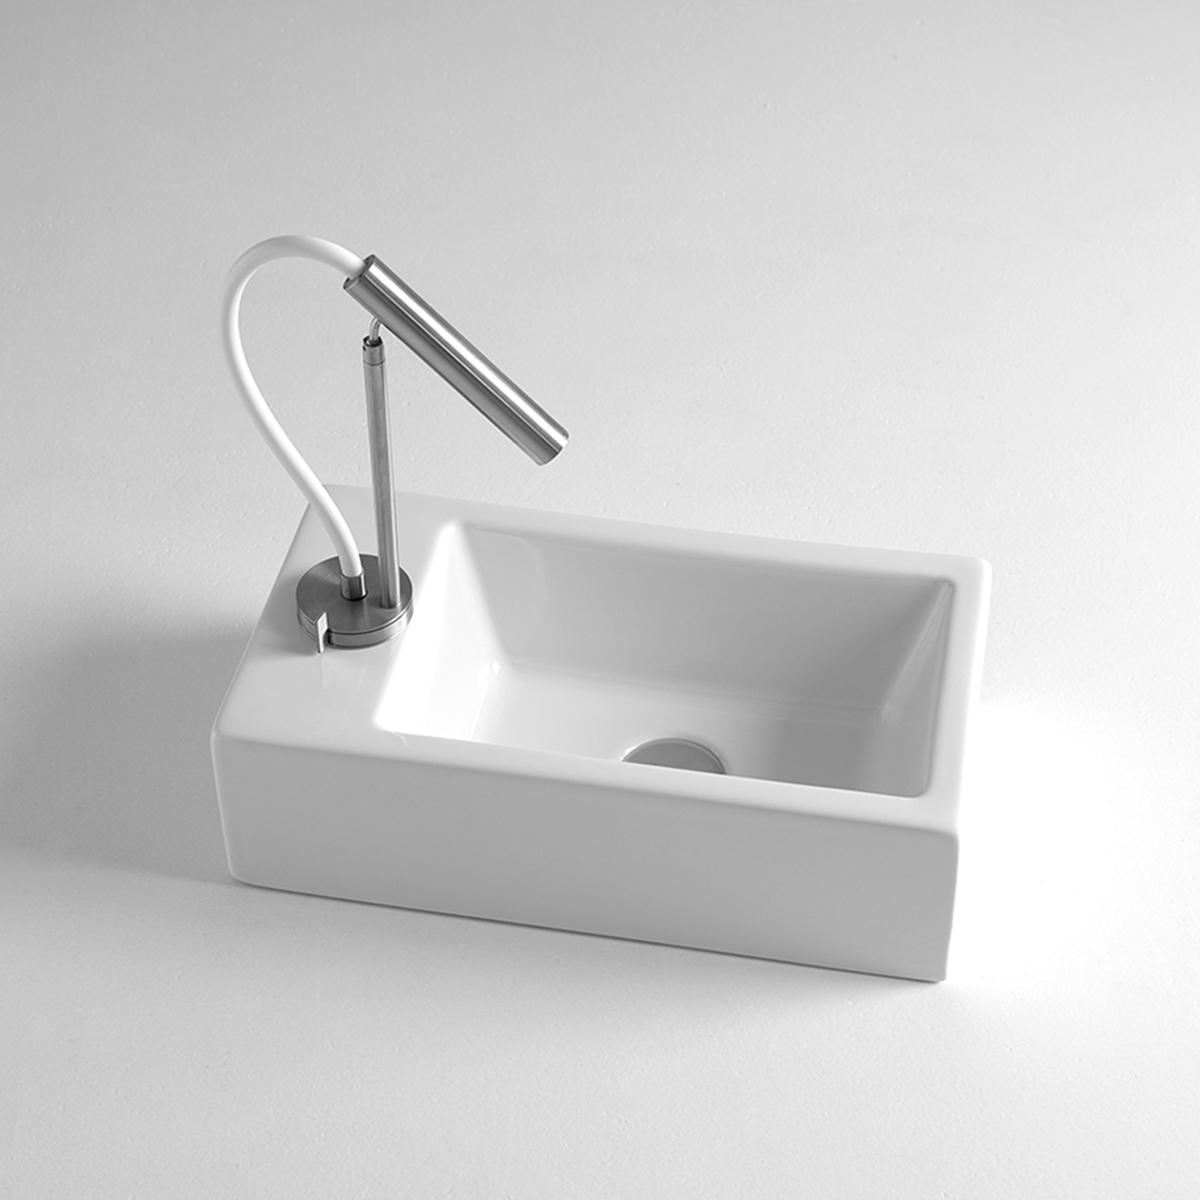 Mini lavabo bagno 24x44 cm - Bagno largo 110 cm ...